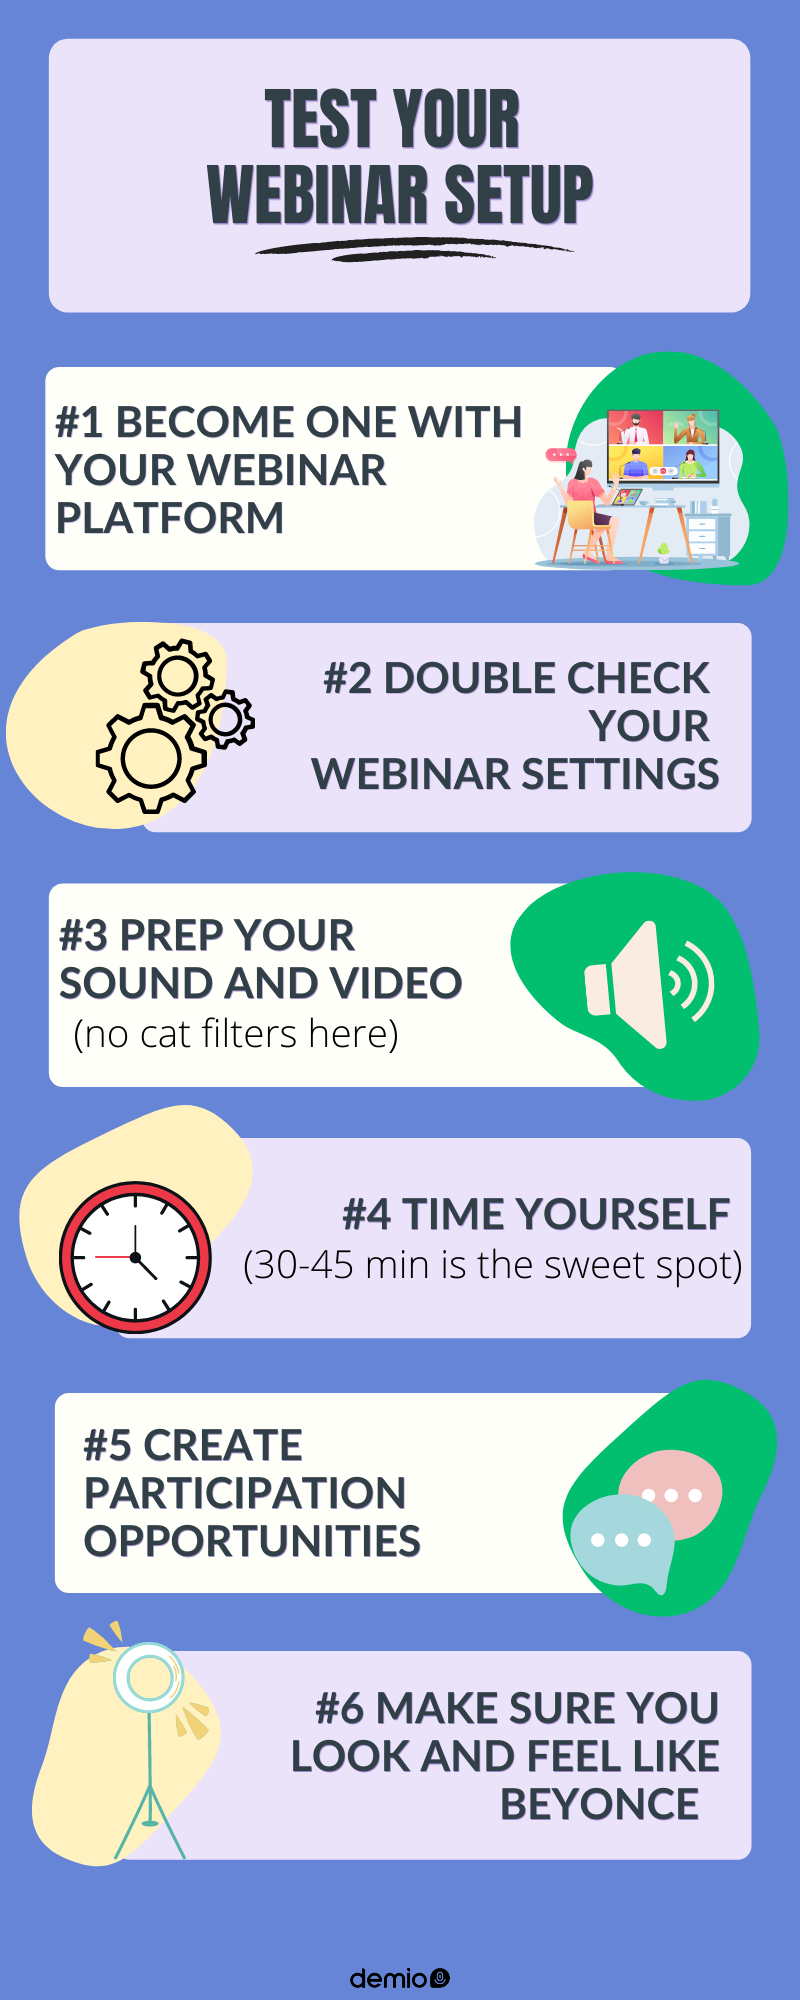 webinar setup infographic